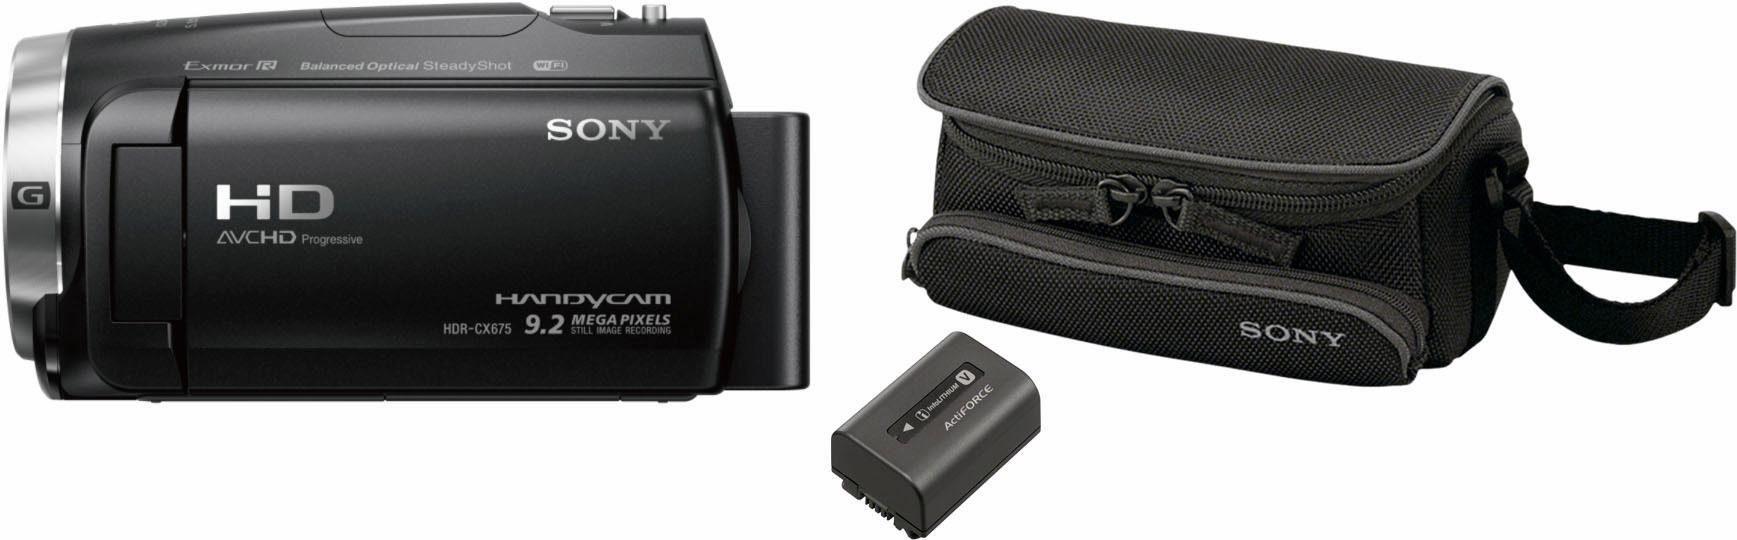 HDRCX625, LCS-U5, NP-FV50 Camcorder Set